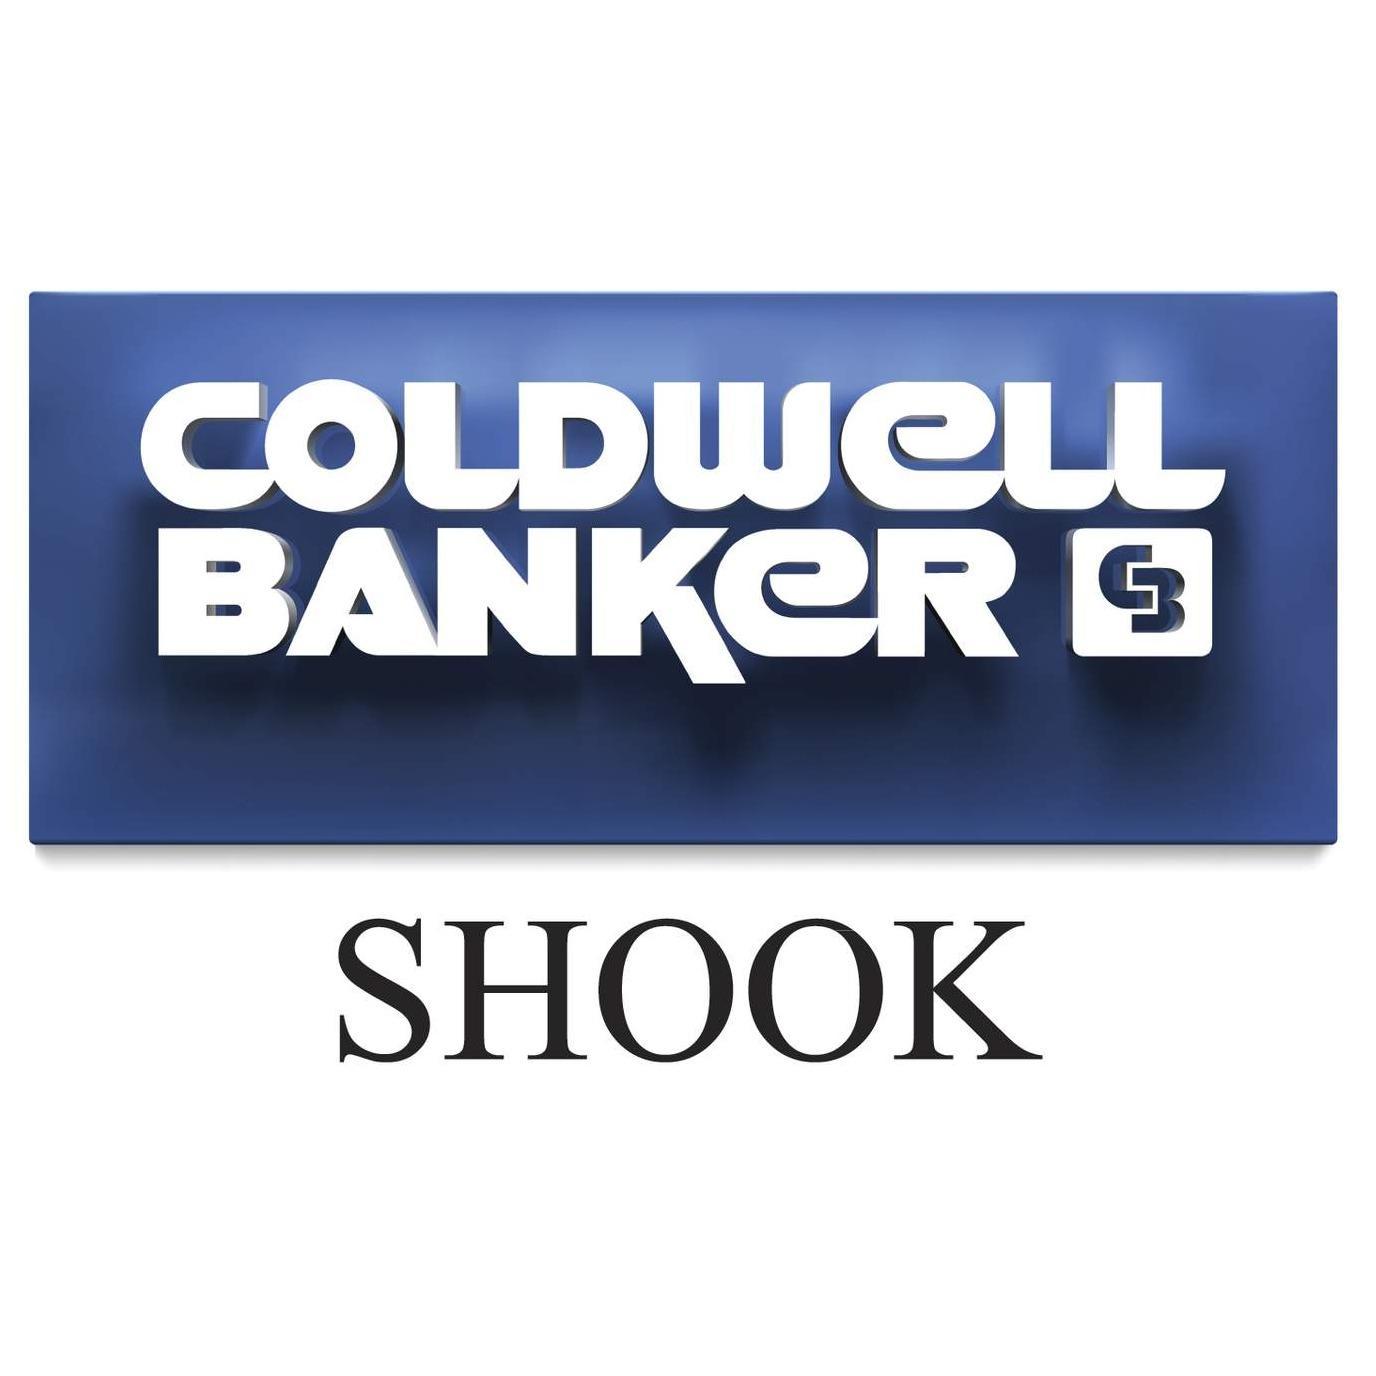 Judith Grossman - Coldwell Banker Shook